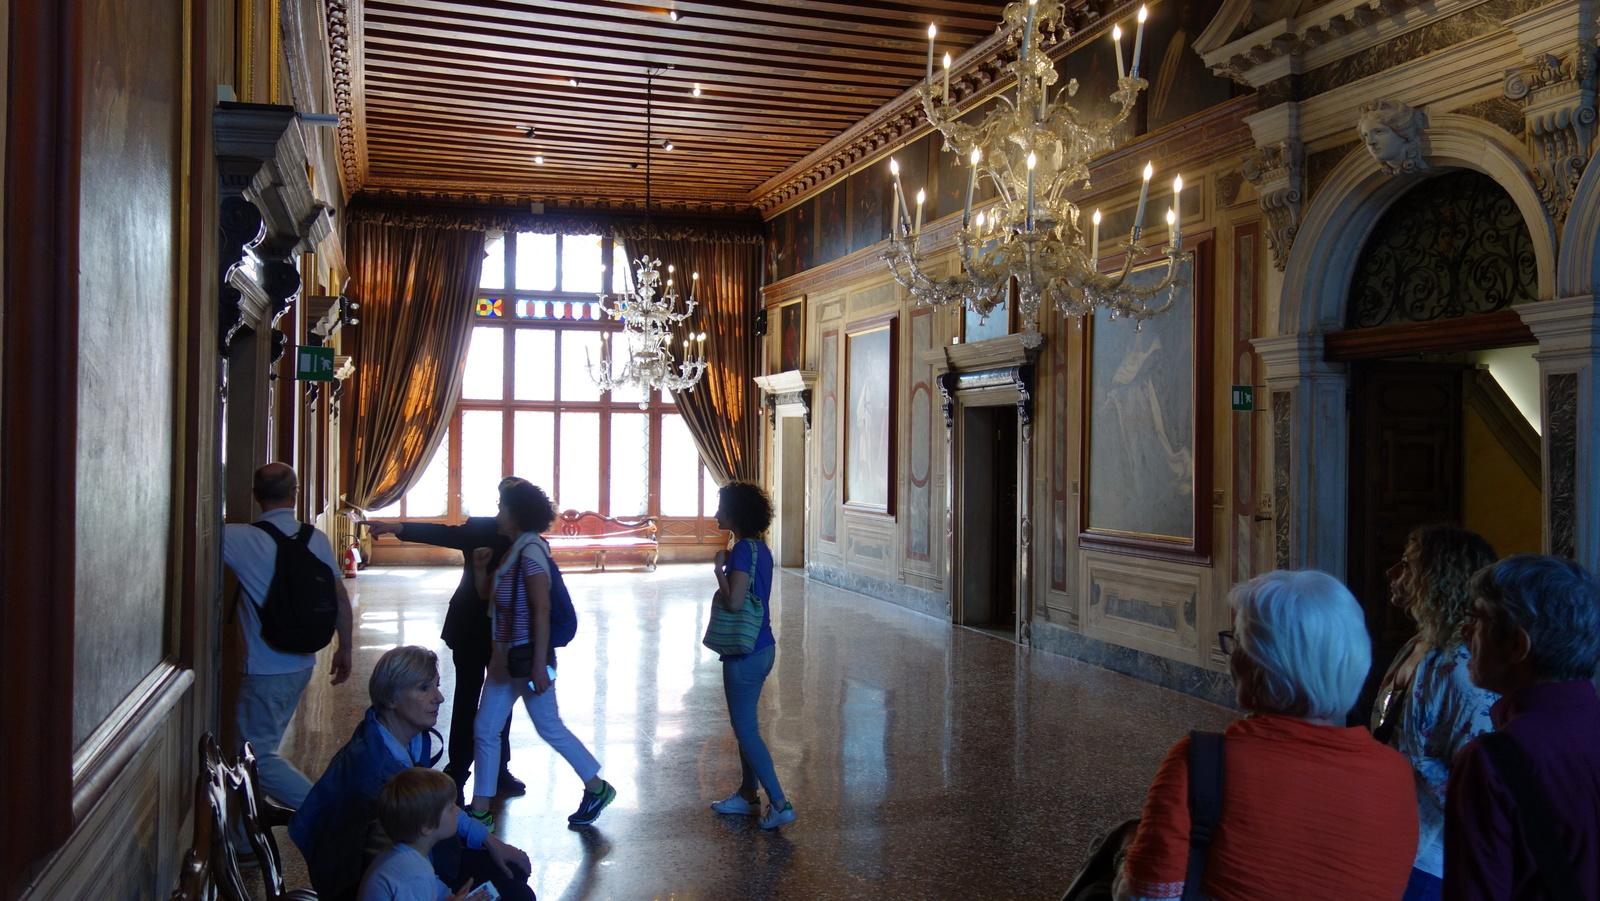 036 - Palazzo Mocenigo